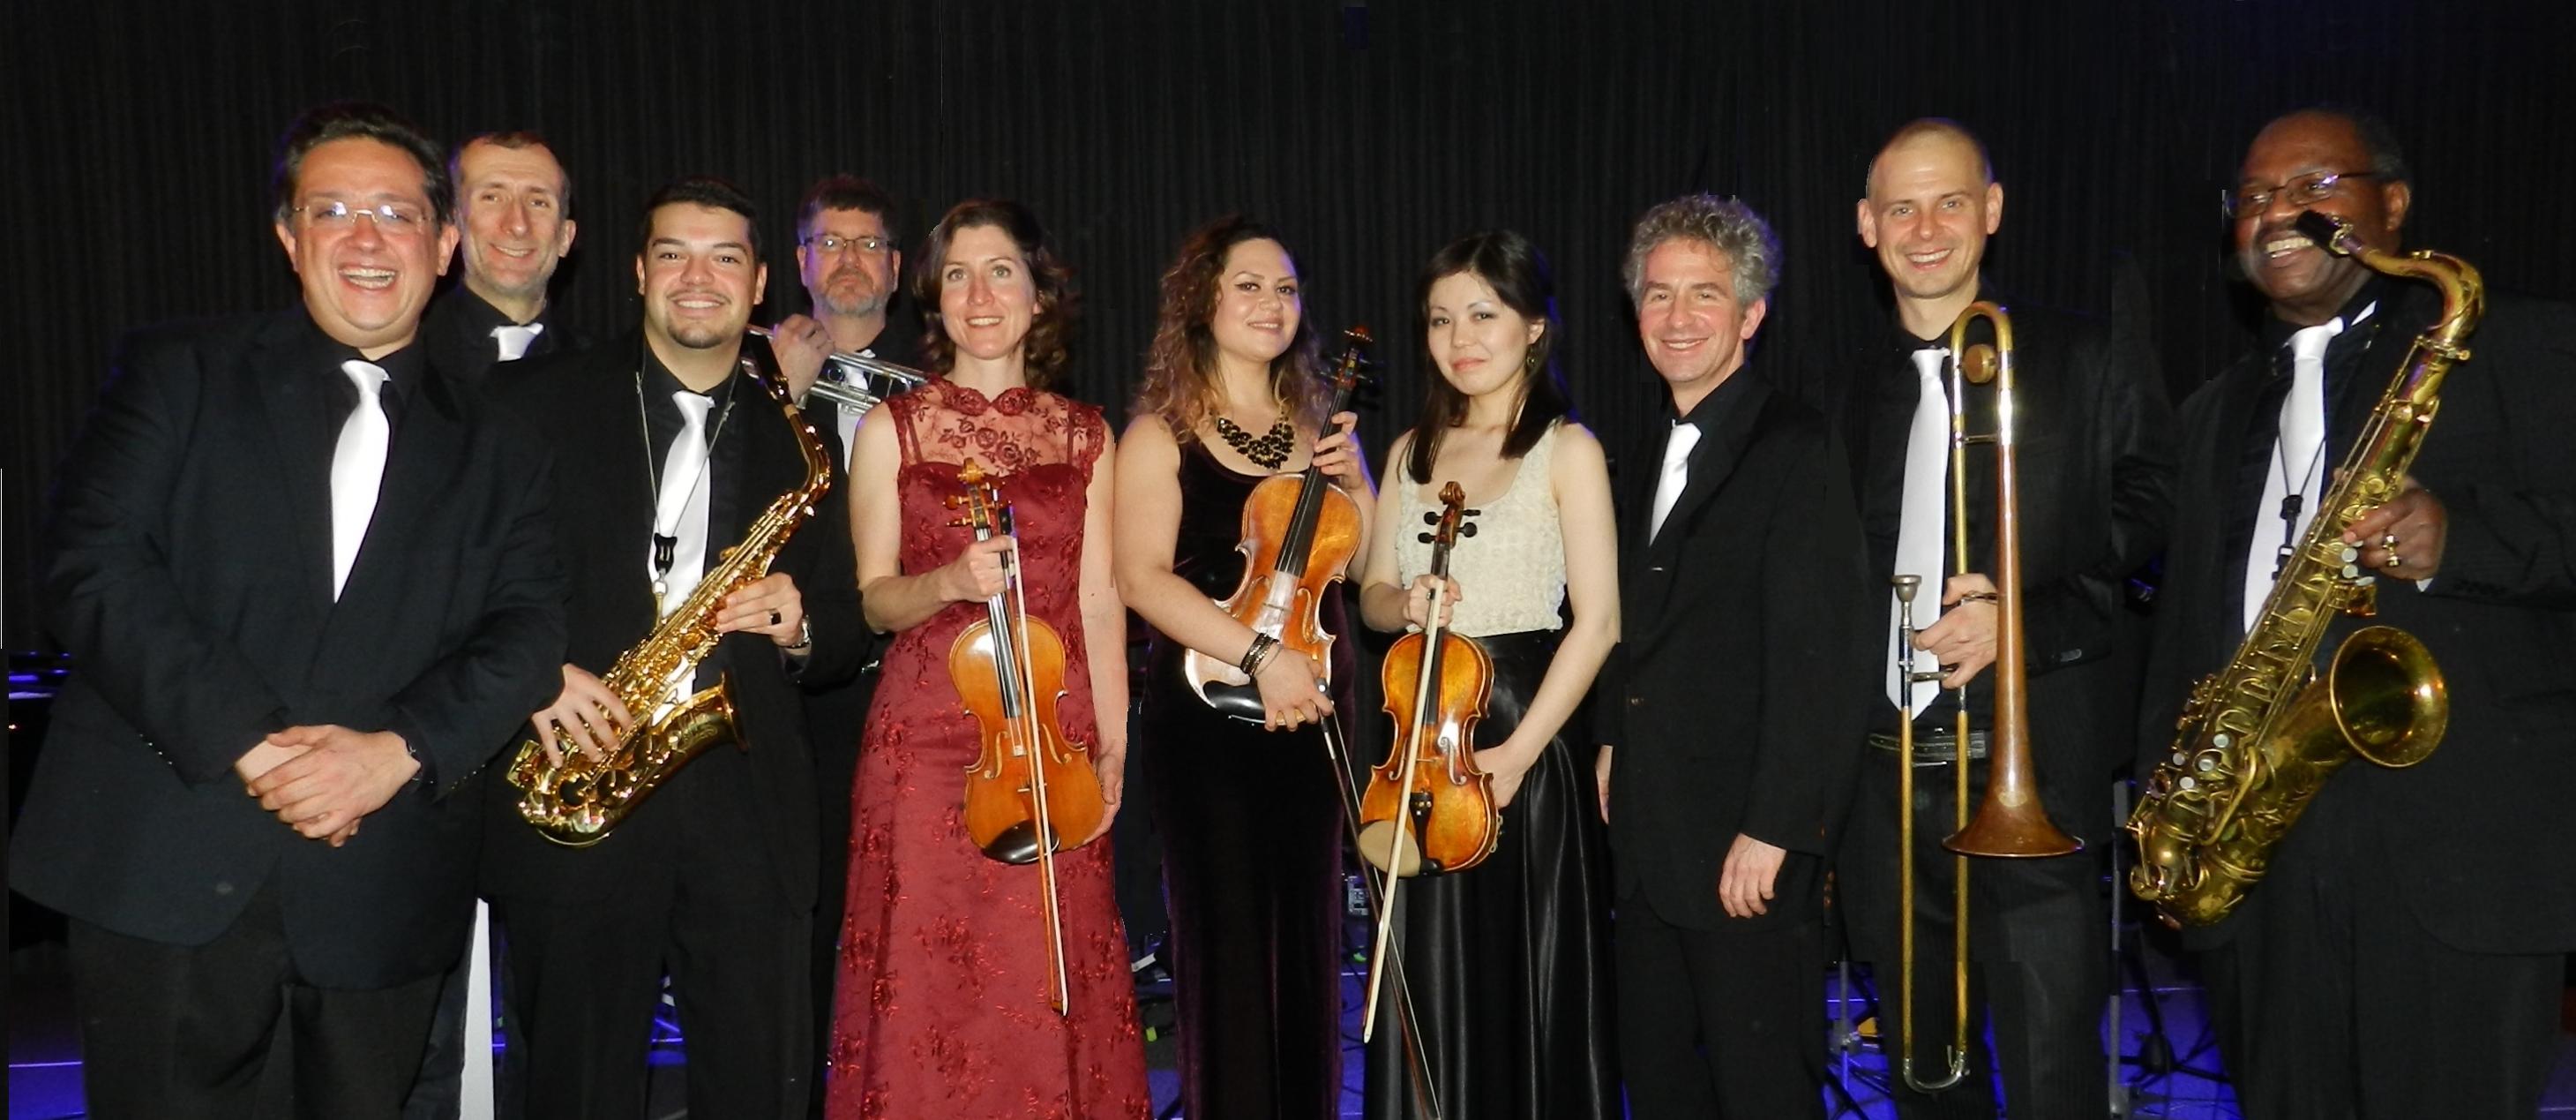 151212 Jazzy Blue Note Orchestra im JazzRadio im Ellington Hotel Berlin_01 @ Ilze Korodi